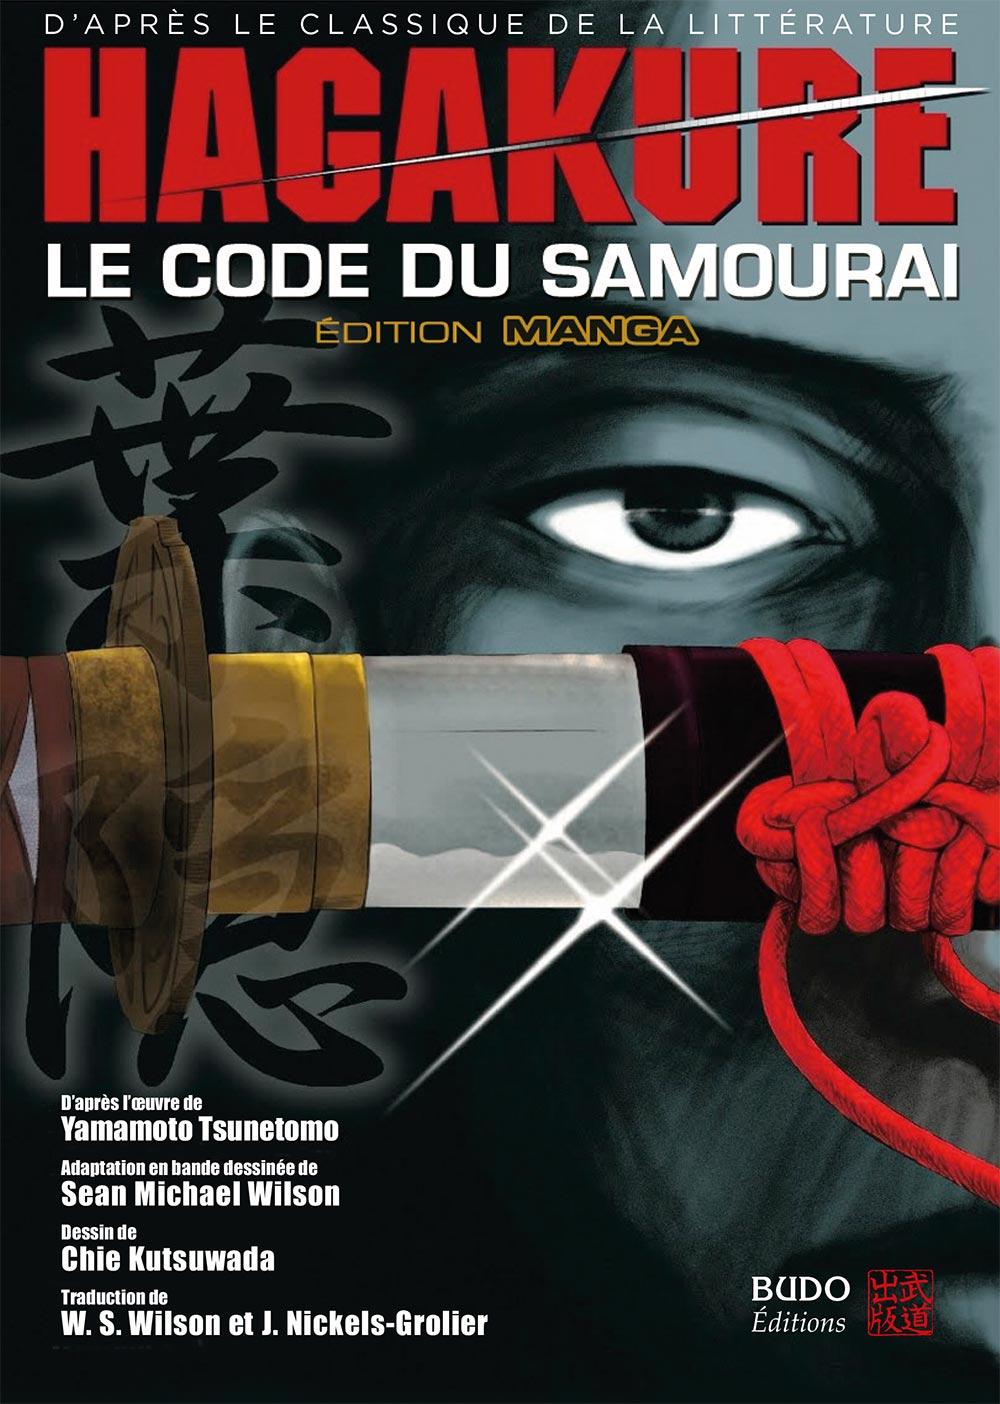 HAGAKURE Le Code du Samouraï (MANGA)